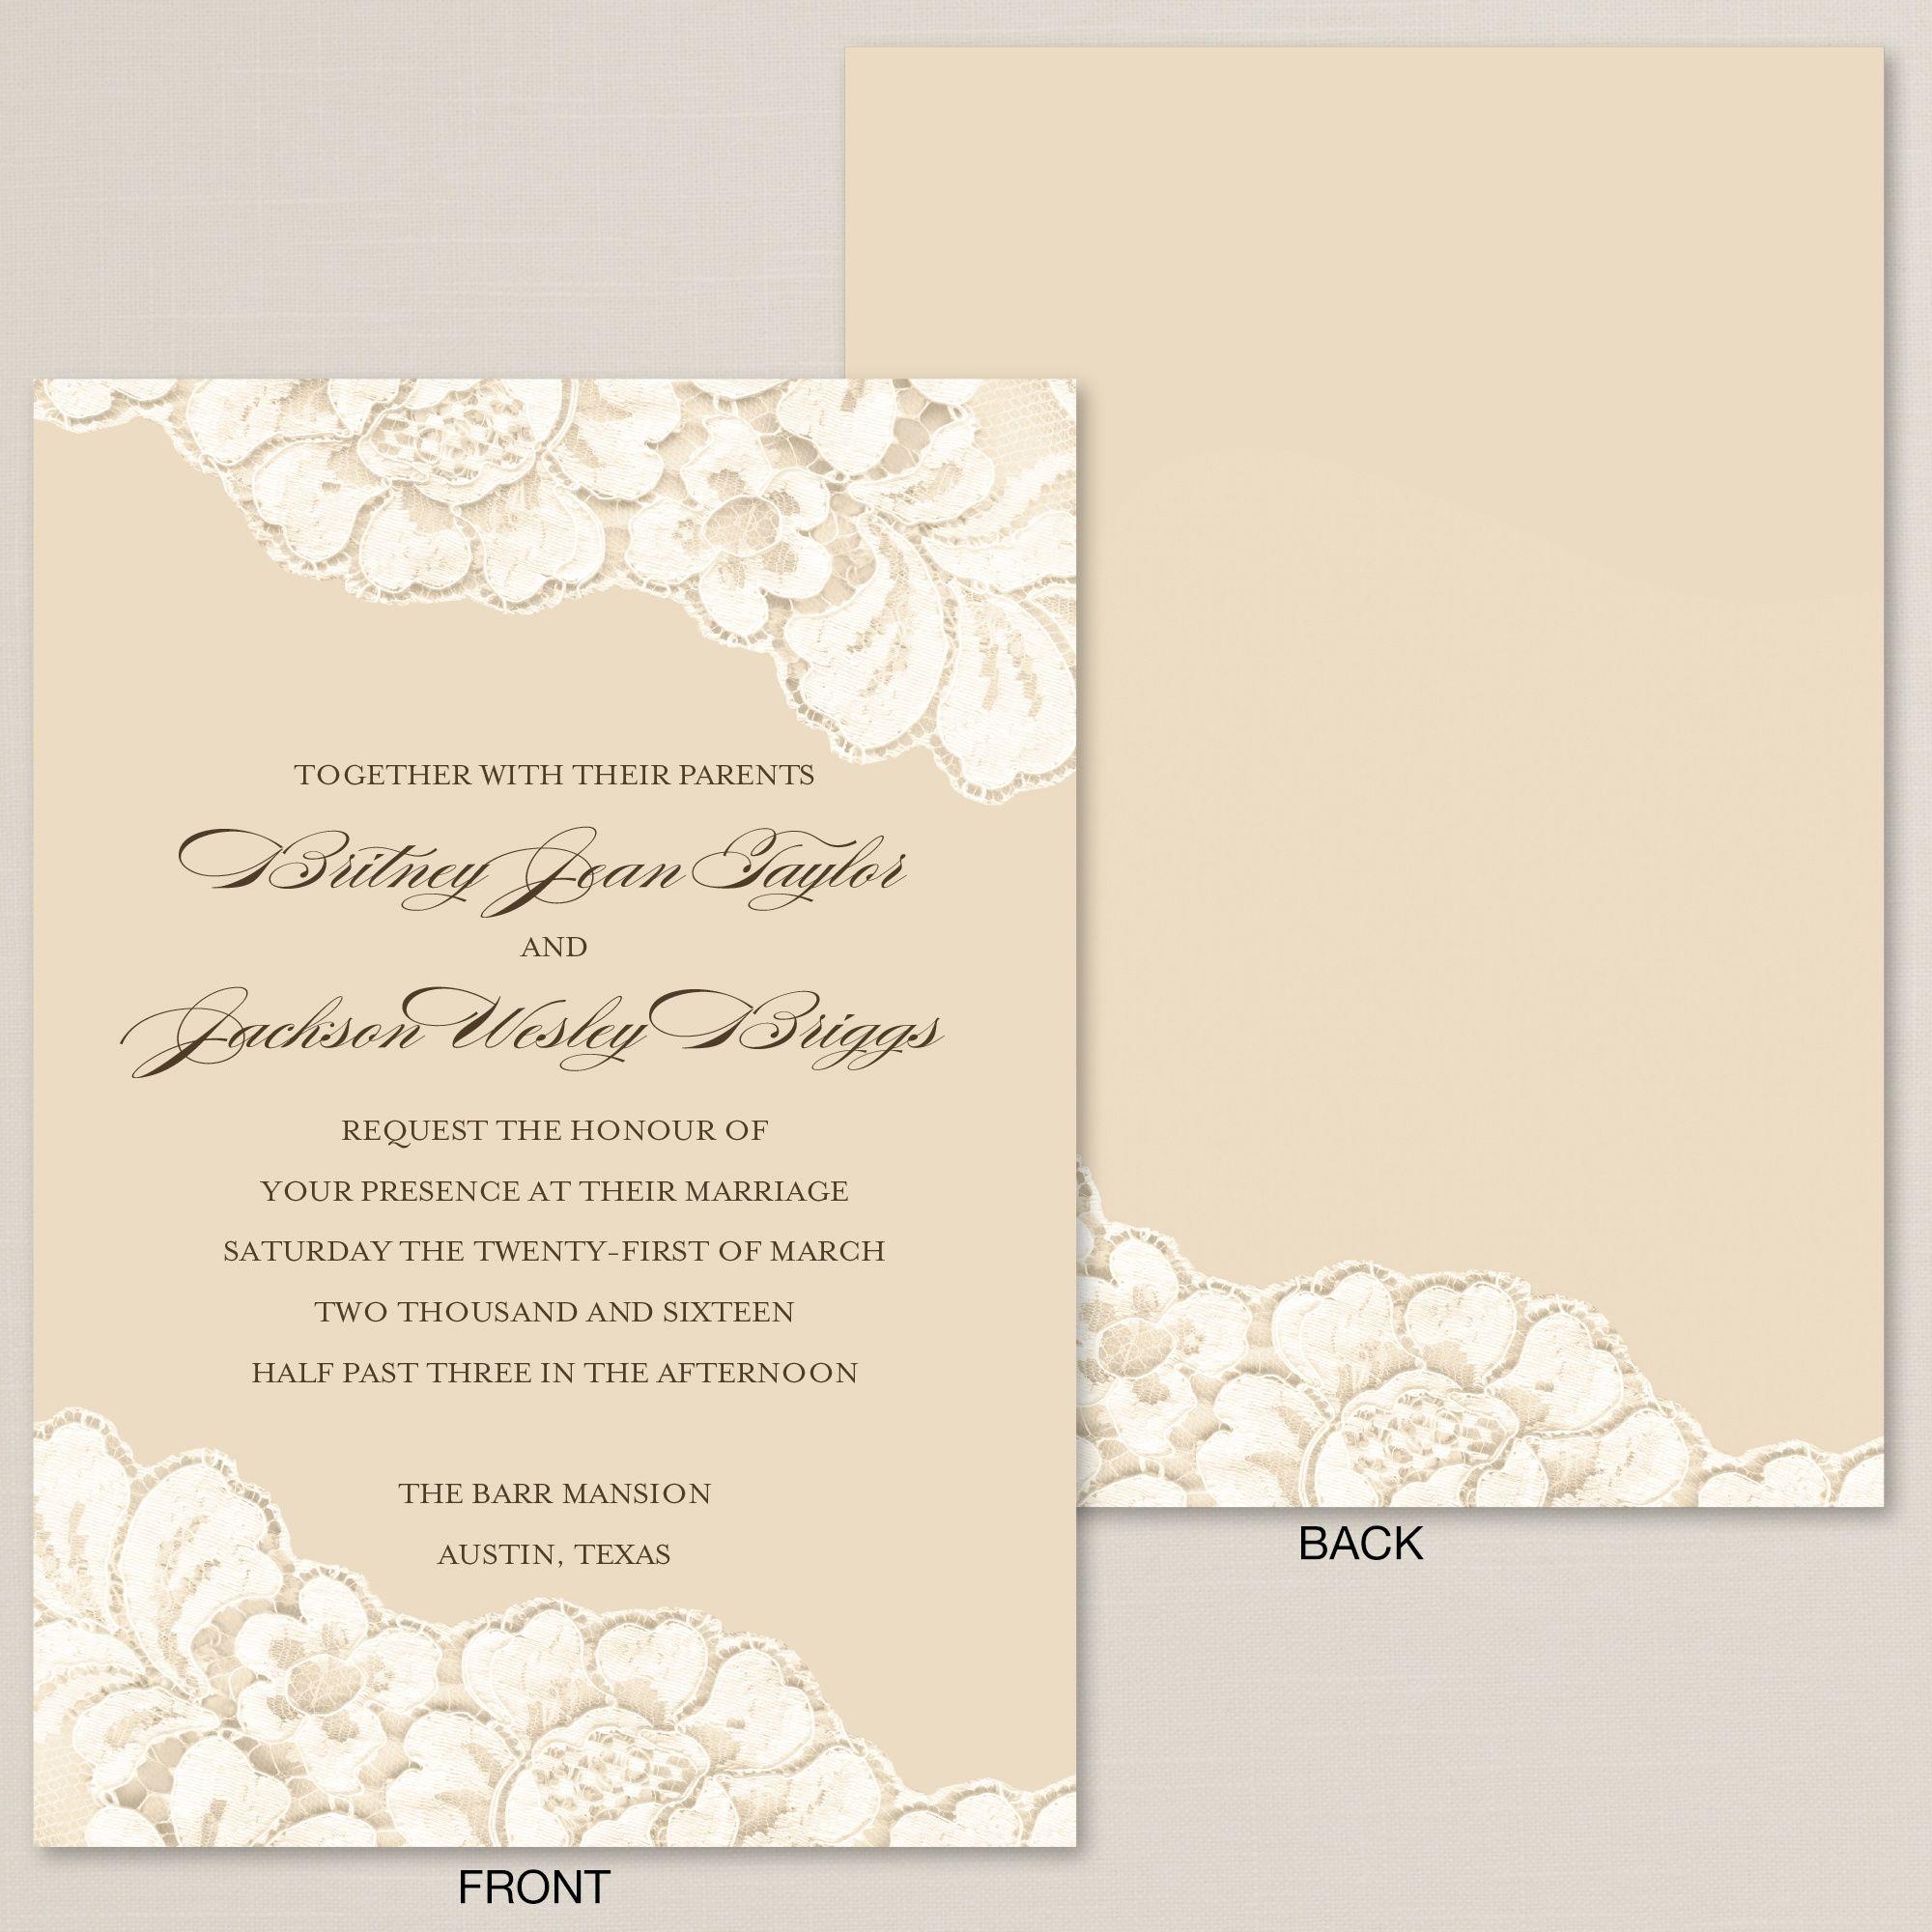 Timeless Lace Wedding Invitation White Lace On Cream Backdrop